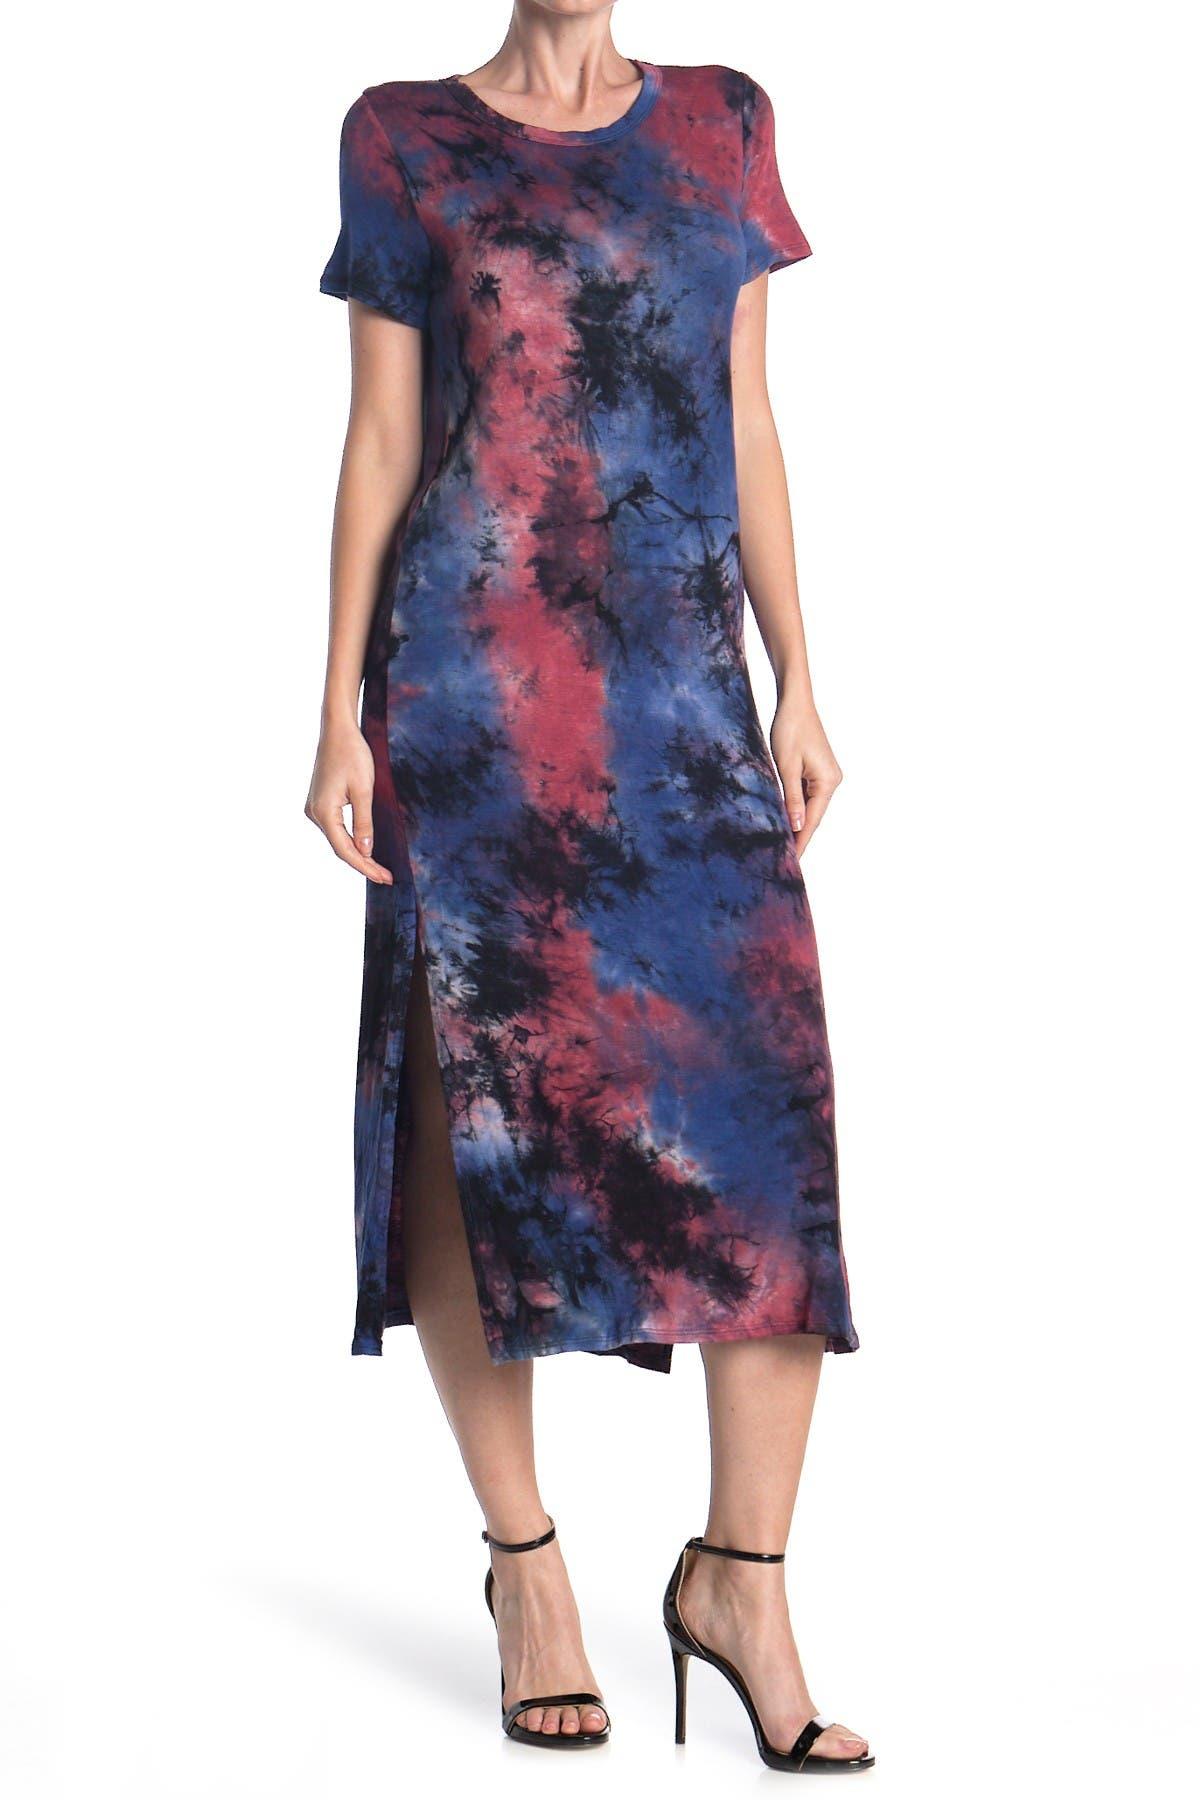 Image of A.Calin Tie-Dye Midi T-Shirt Dress